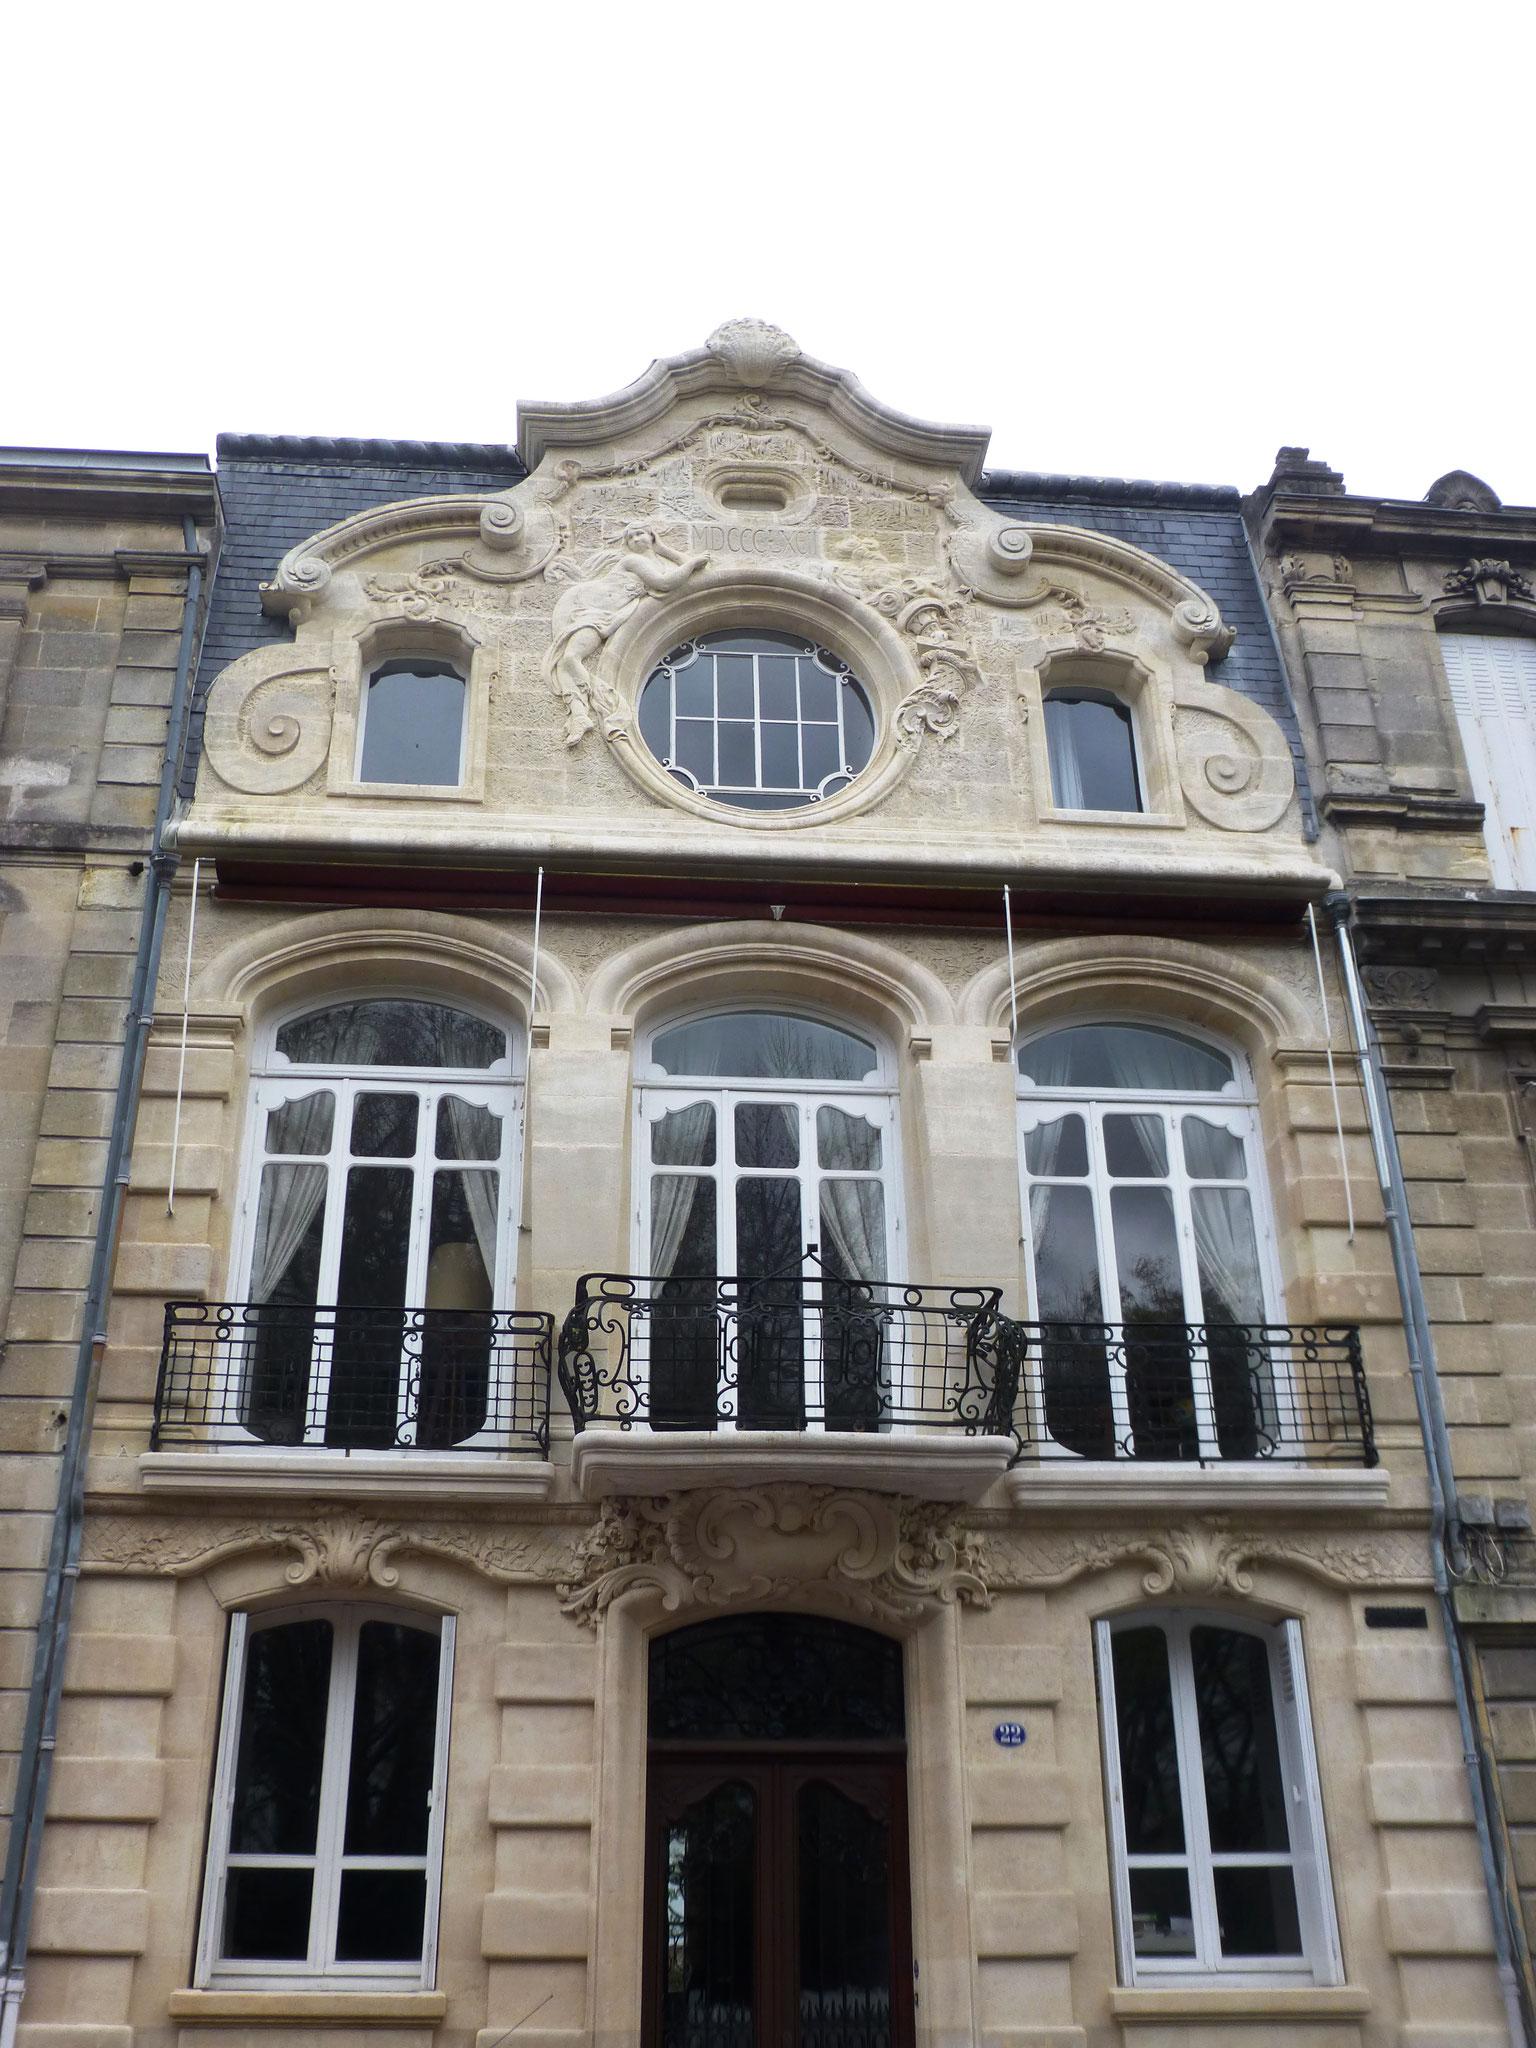 Maison au style néo rococo, 22 avenue Carnot